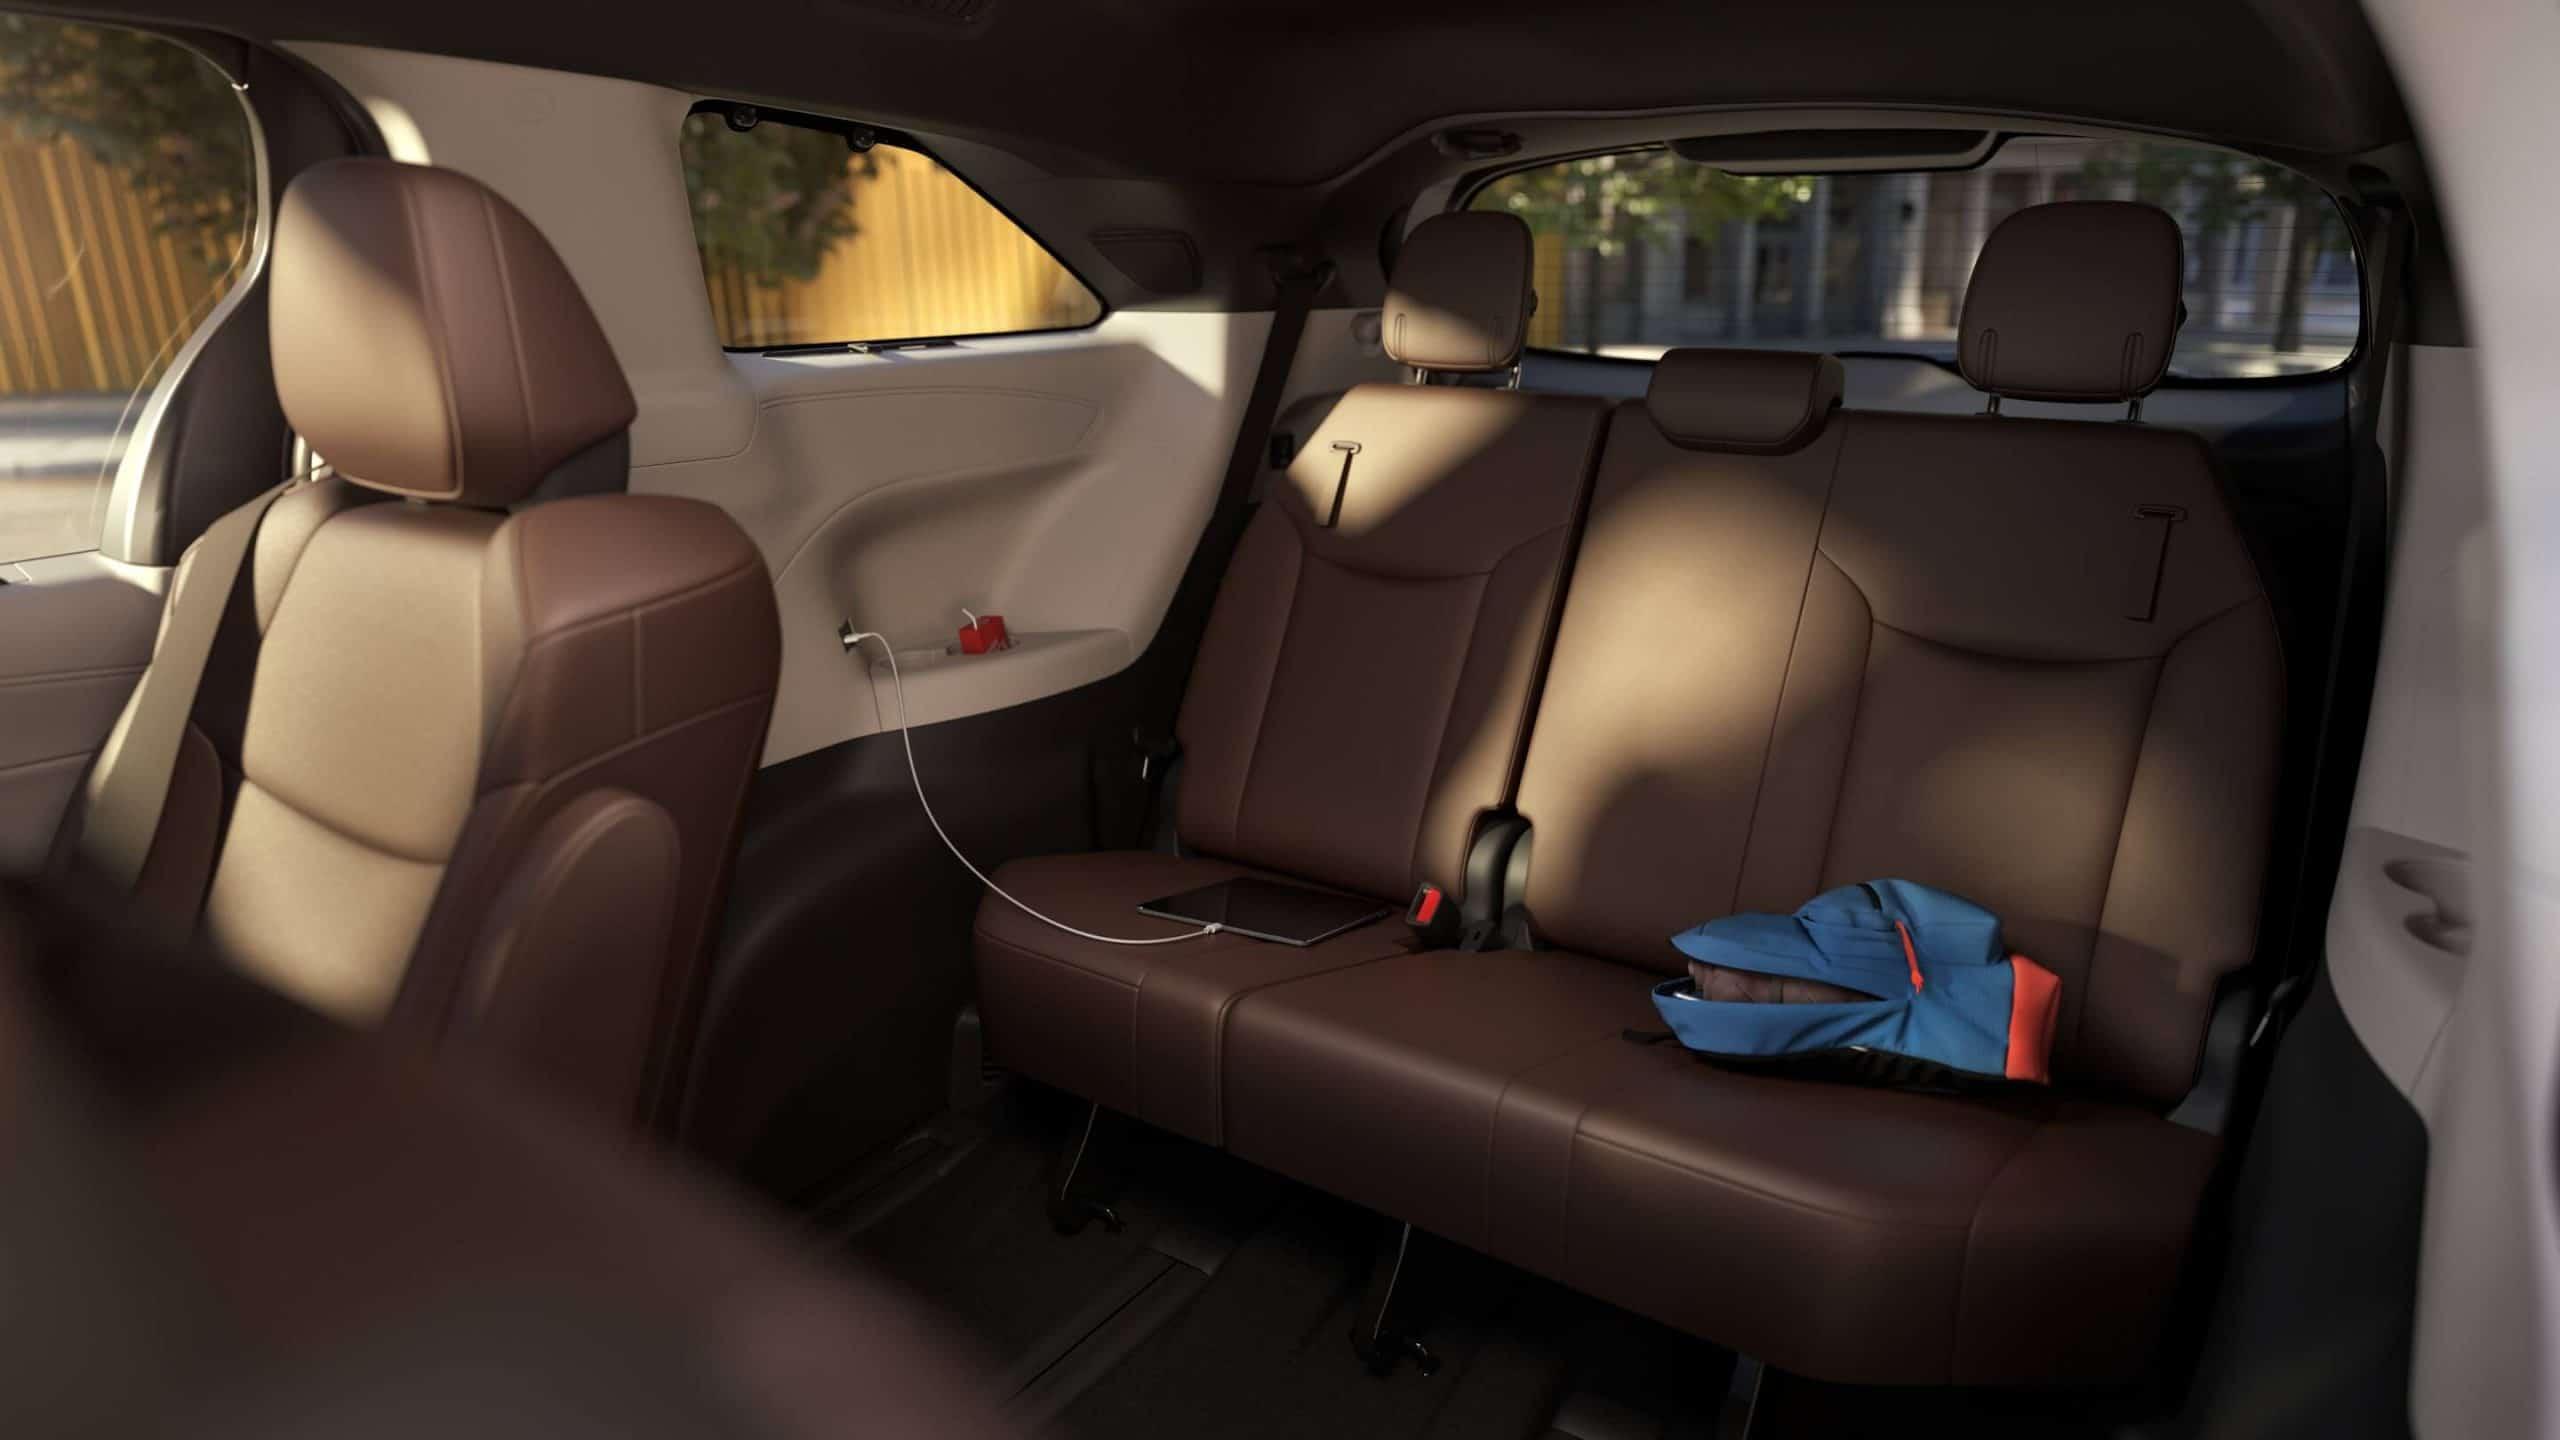 New Toyota Sienna third row seats